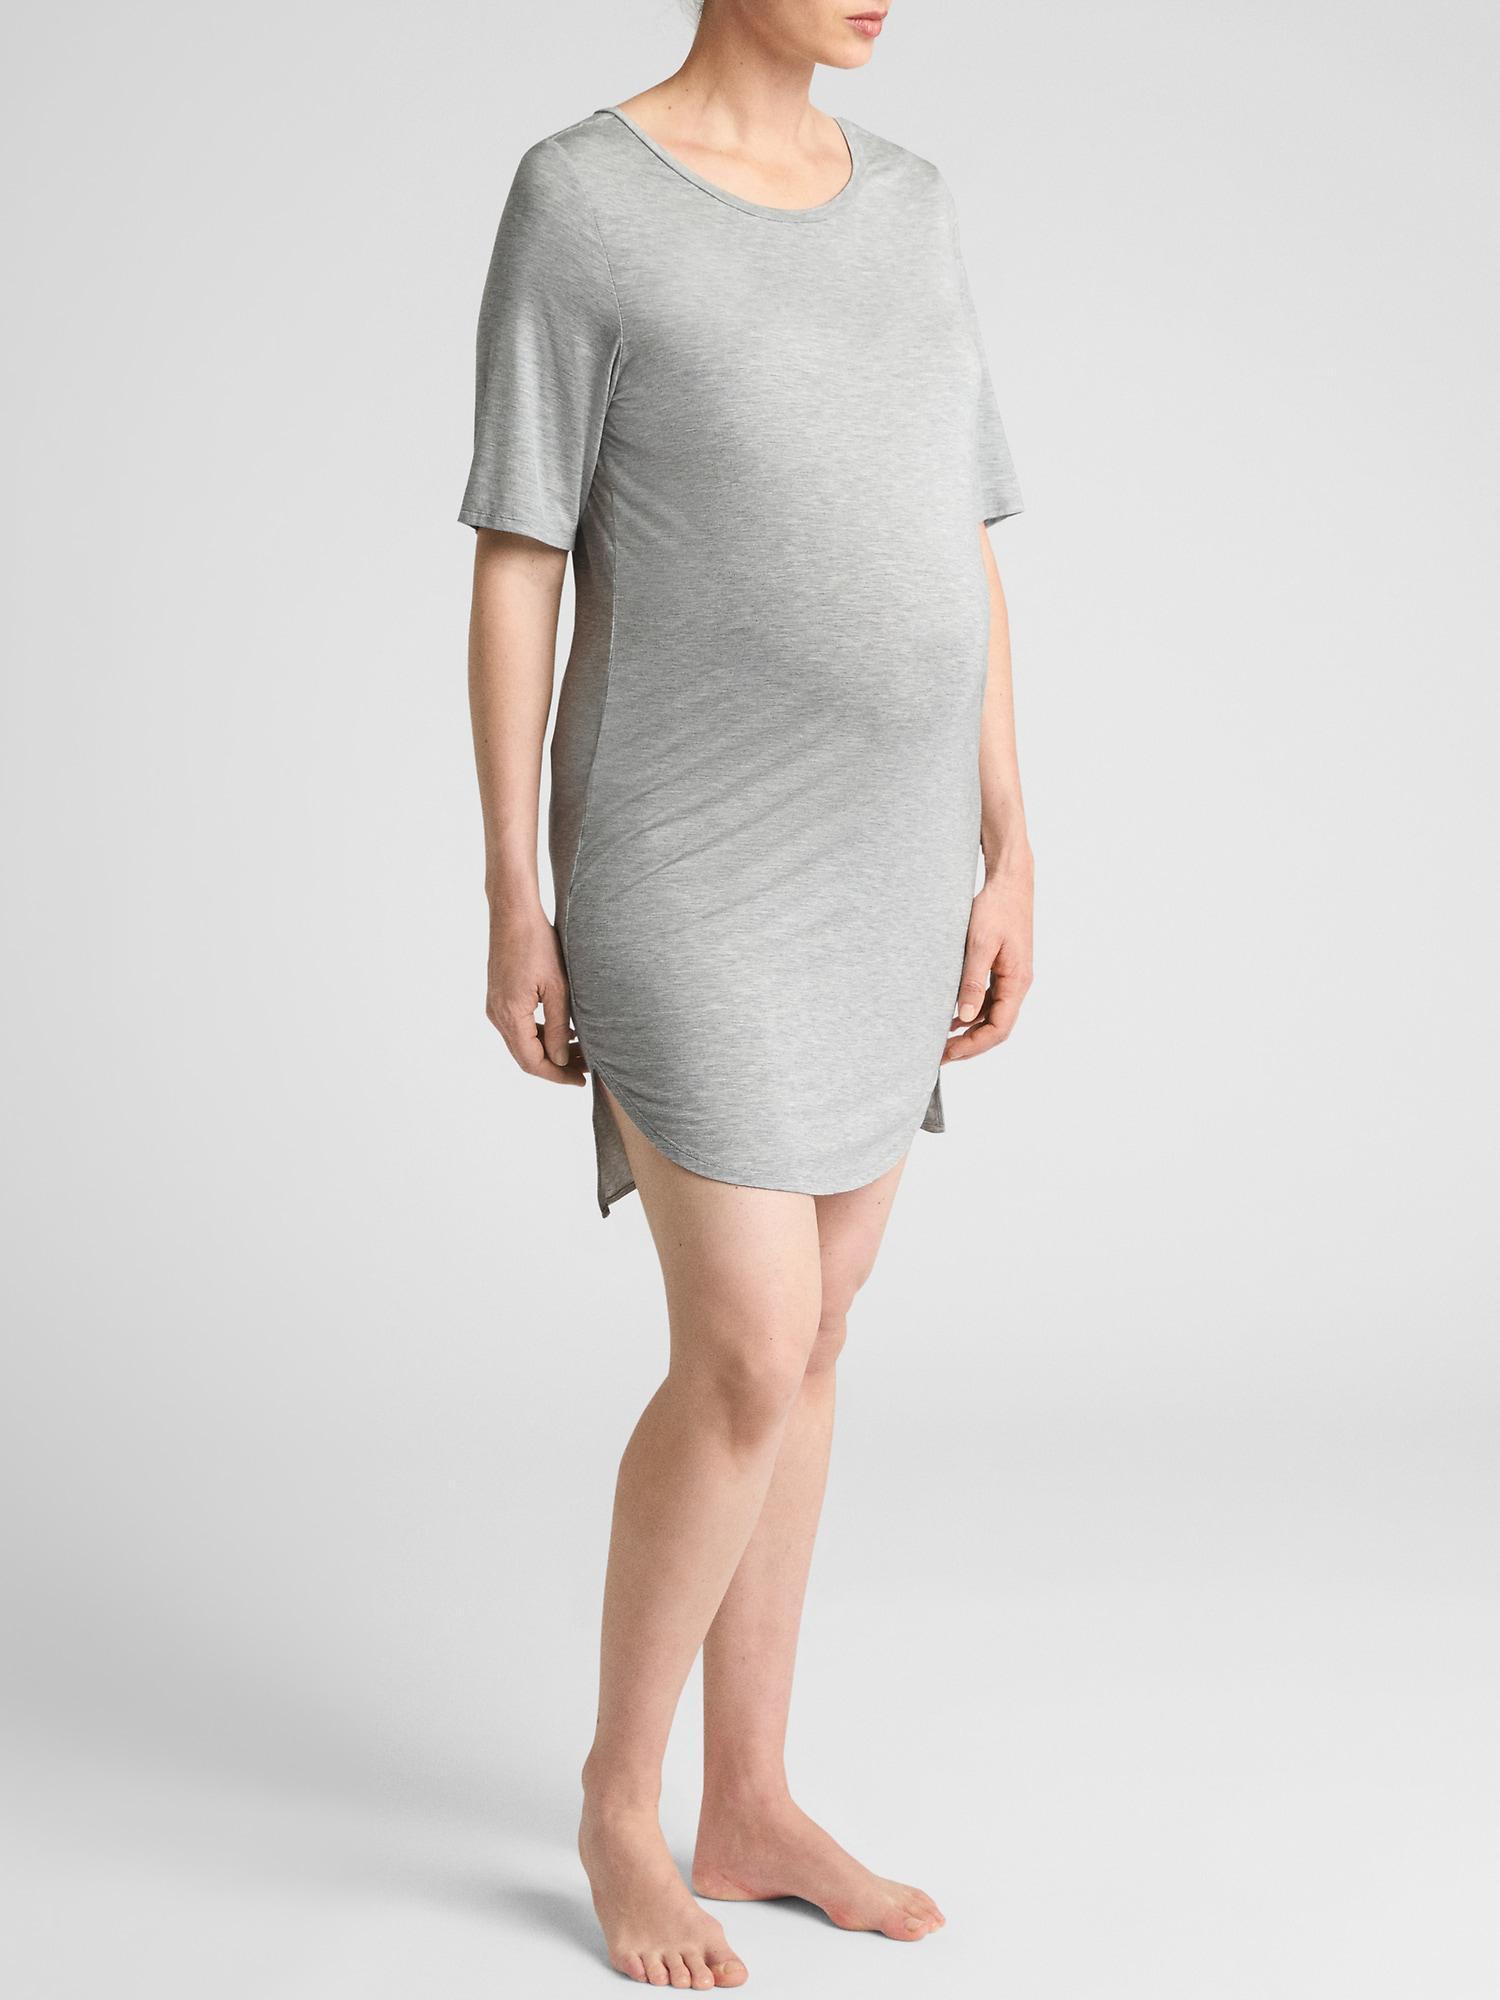 51e796cb6d1f5 Lyst - Gap Factory Maternity Modal Sleep Nightgown in Gray